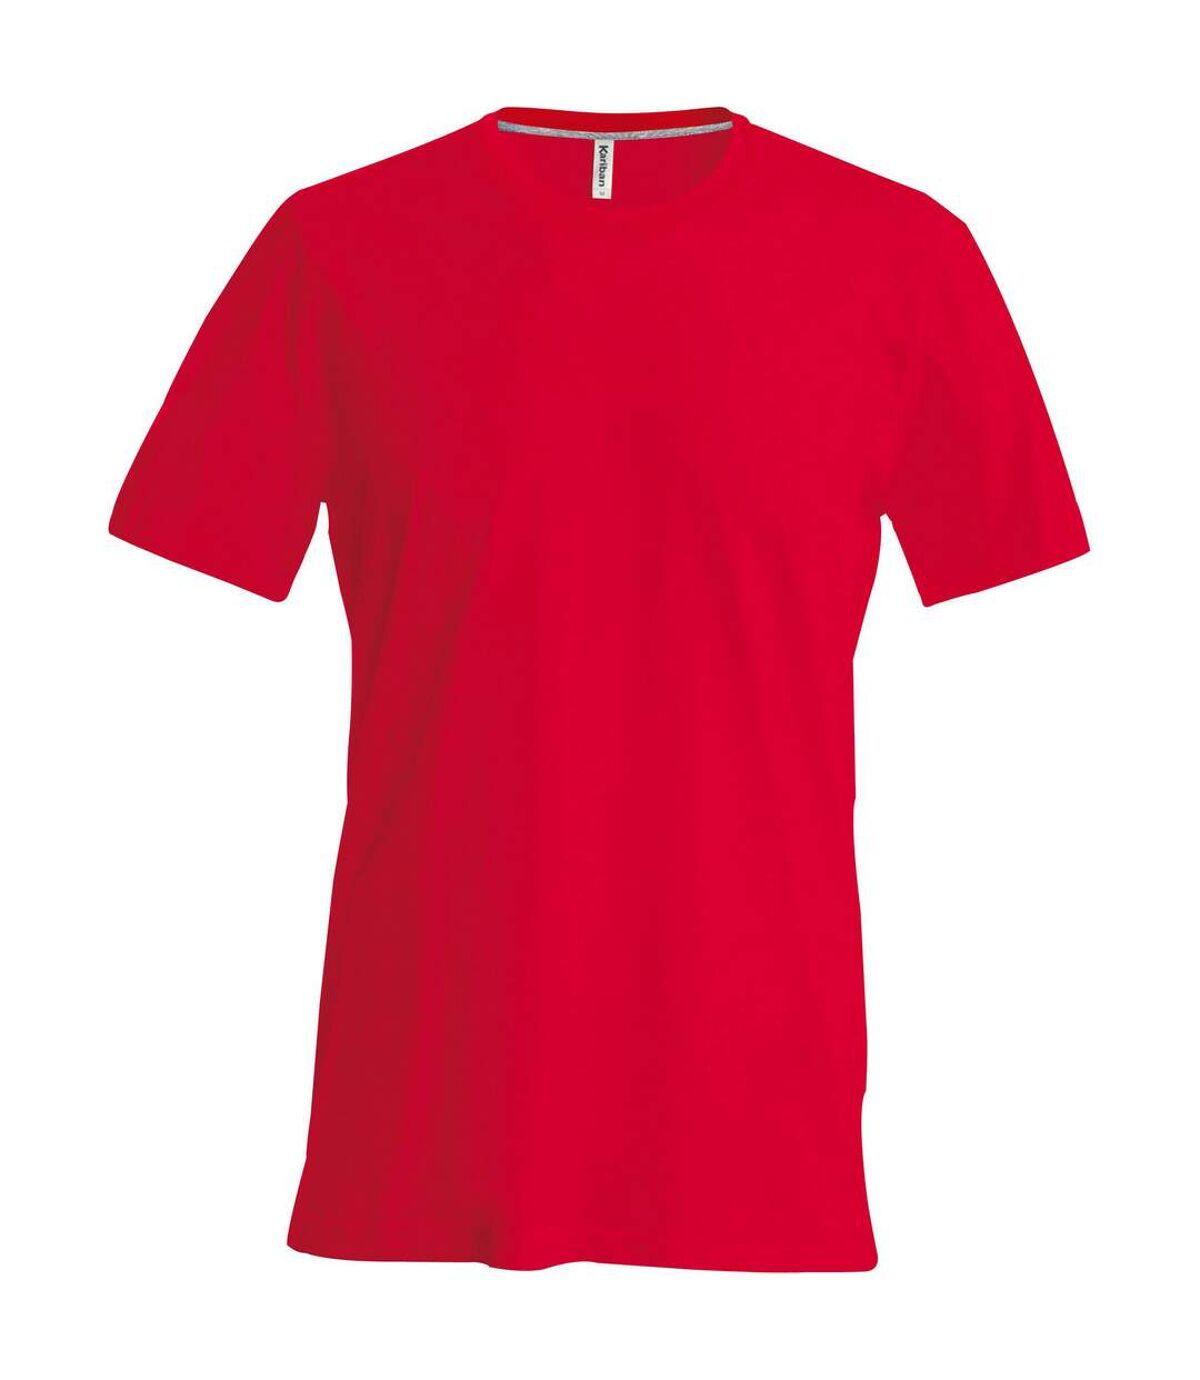 Kariban Mens Slim Fit Short Sleeve Crew Neck T-Shirt (Red) - UTRW706